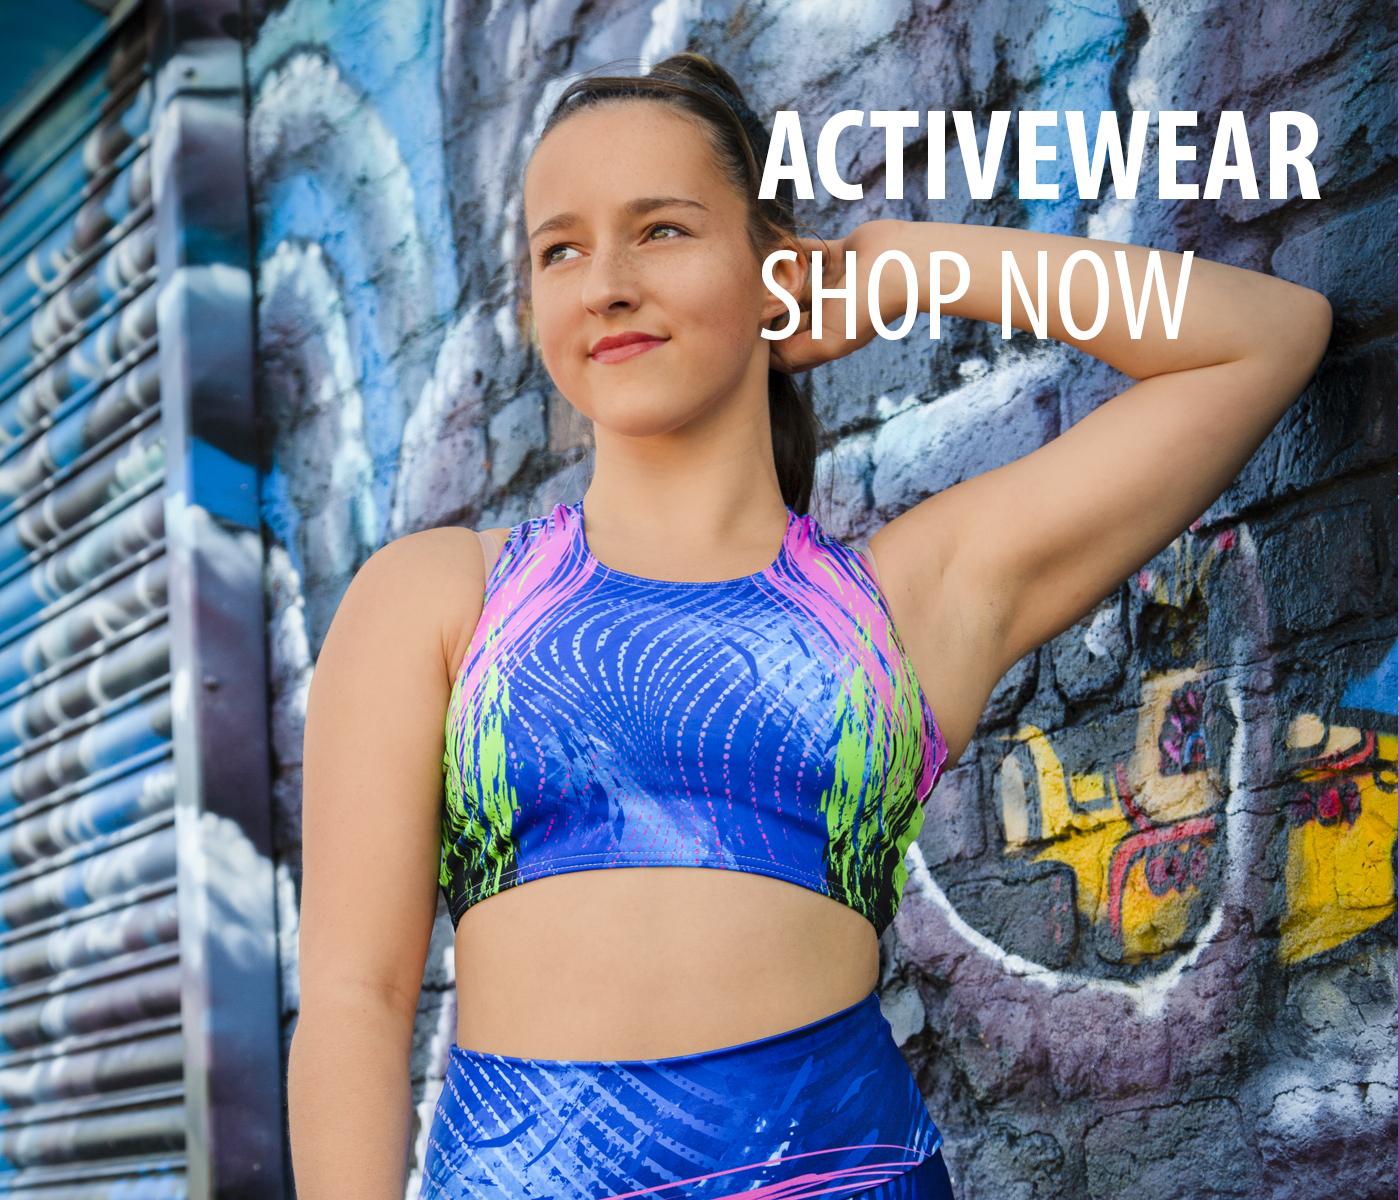 Activewear Shop Now